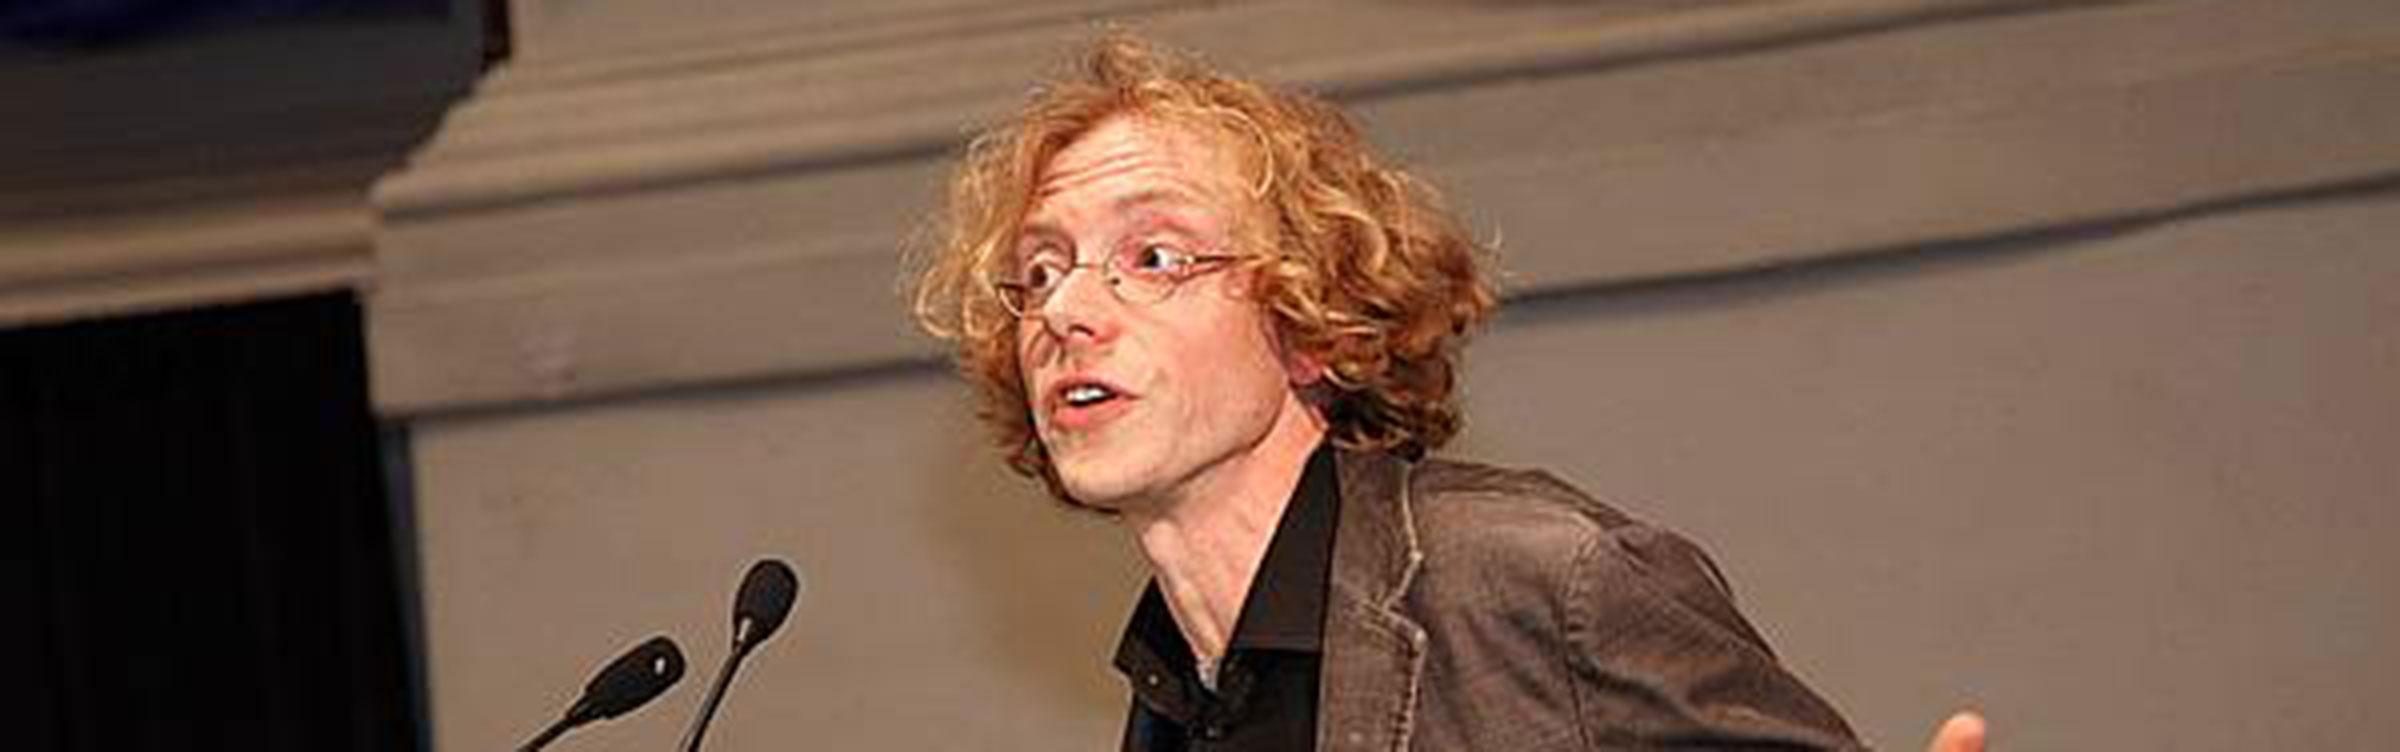 200905 hendrikvos